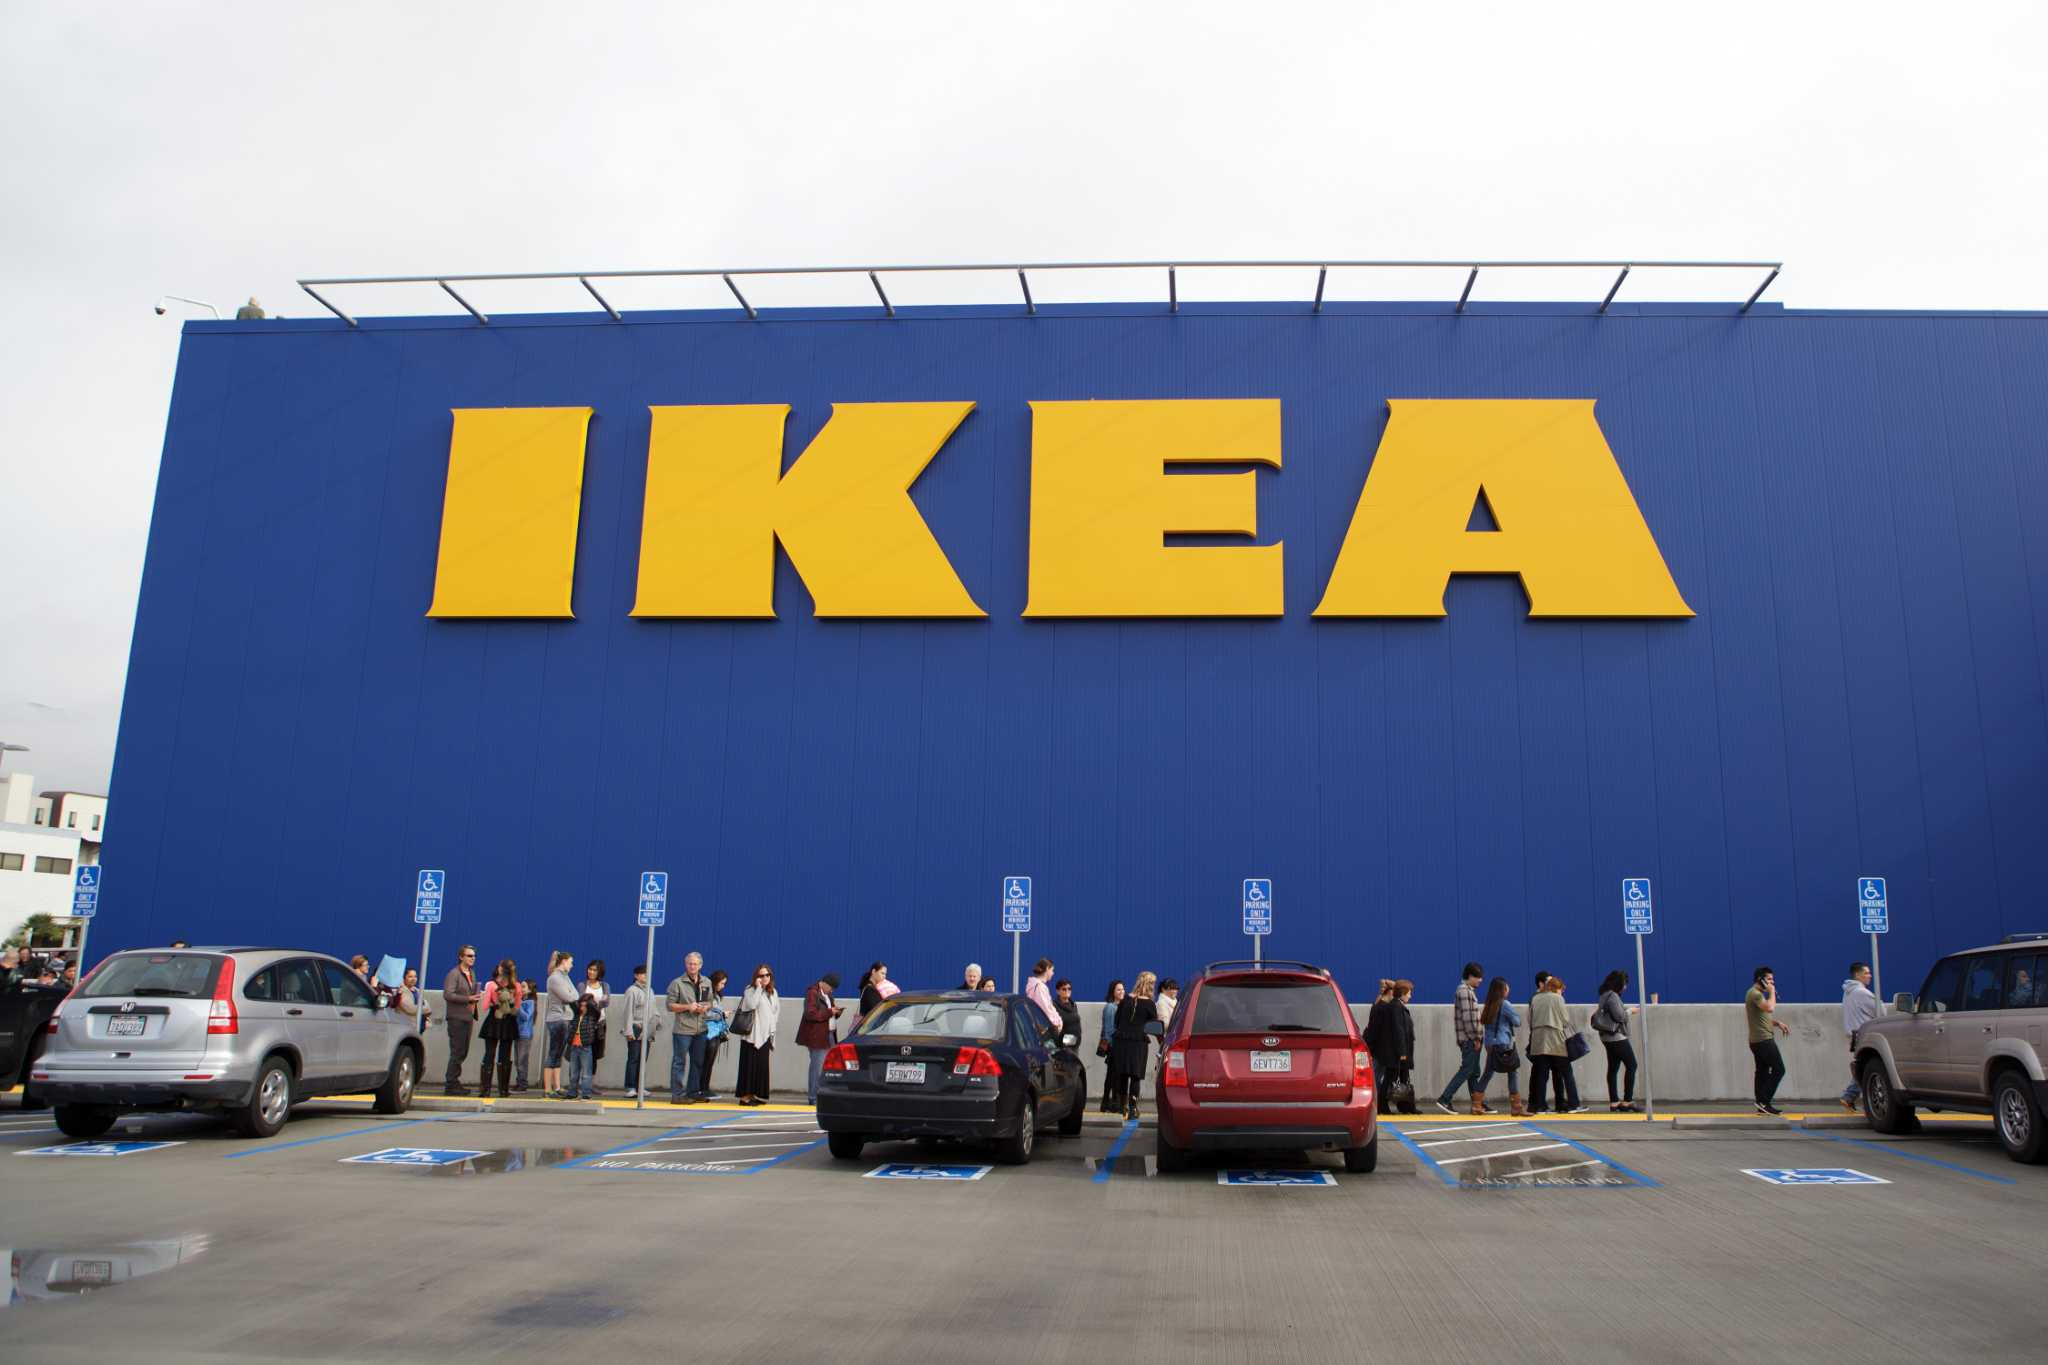 Ikea names brodin new ceo san antonio express news for Ikea san antonio